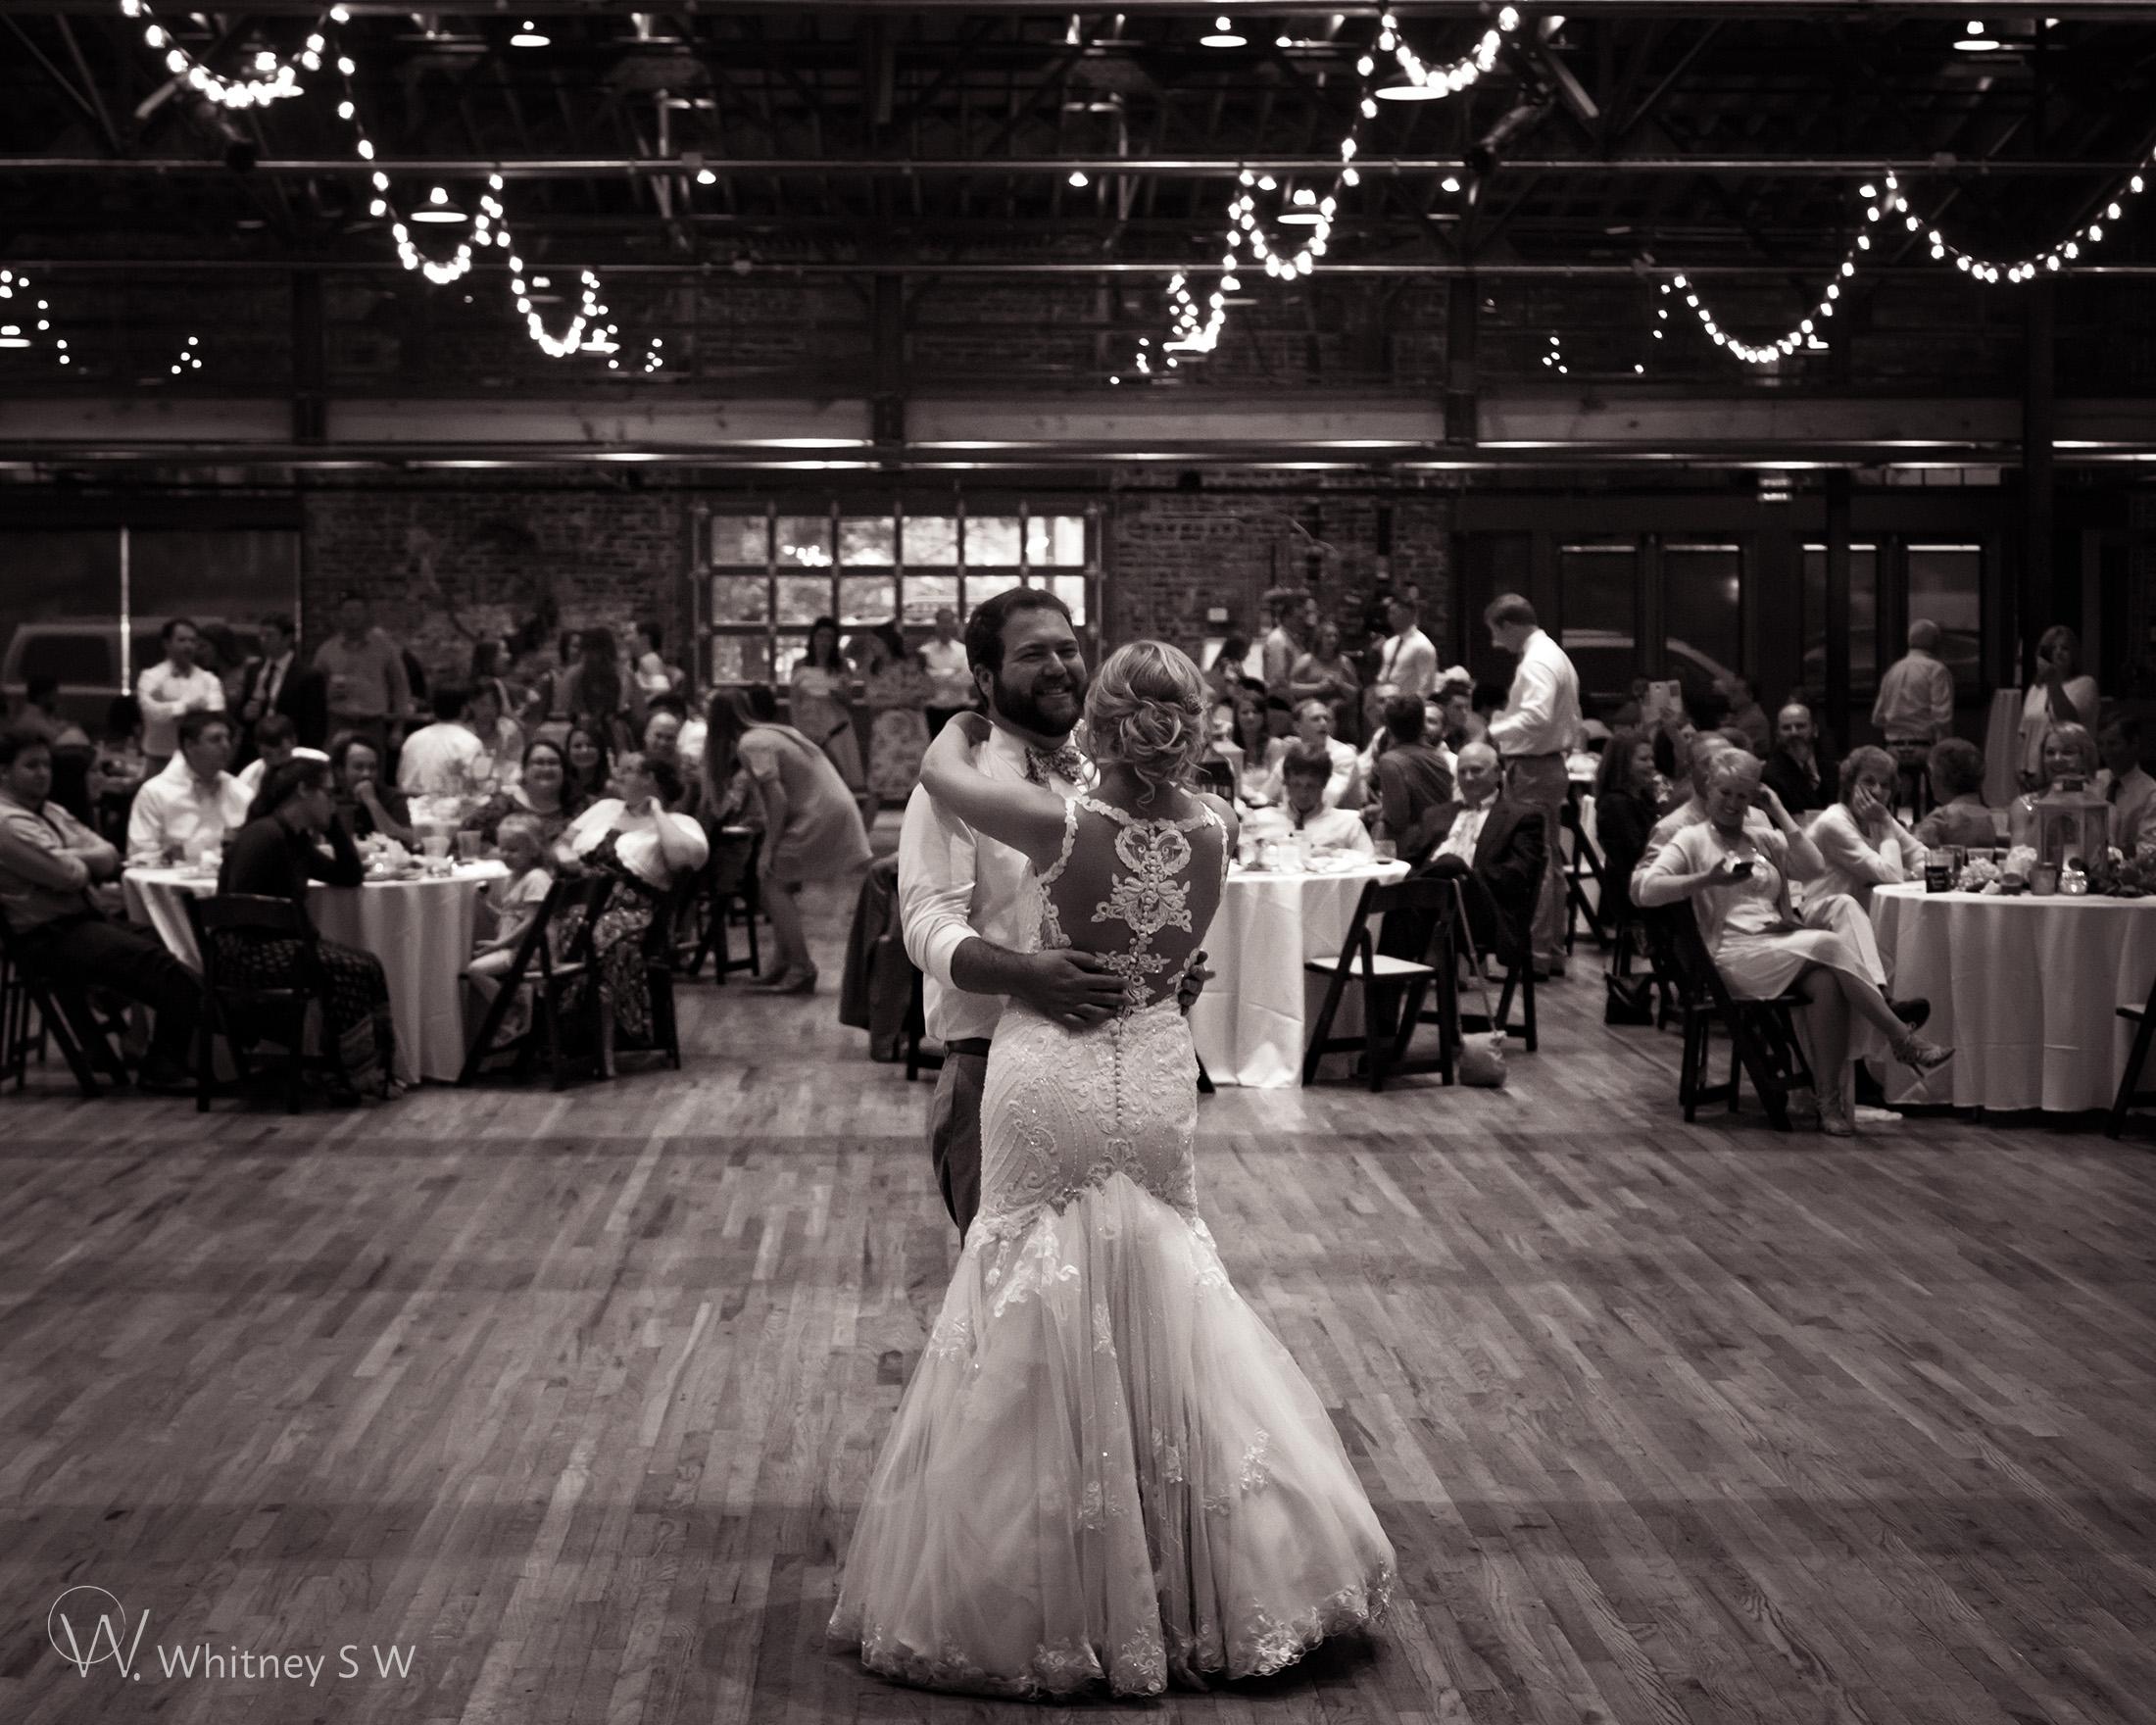 Morgan & Kaivon Wedding - Photography by Whitney S Williams whitneysw (48).jpg